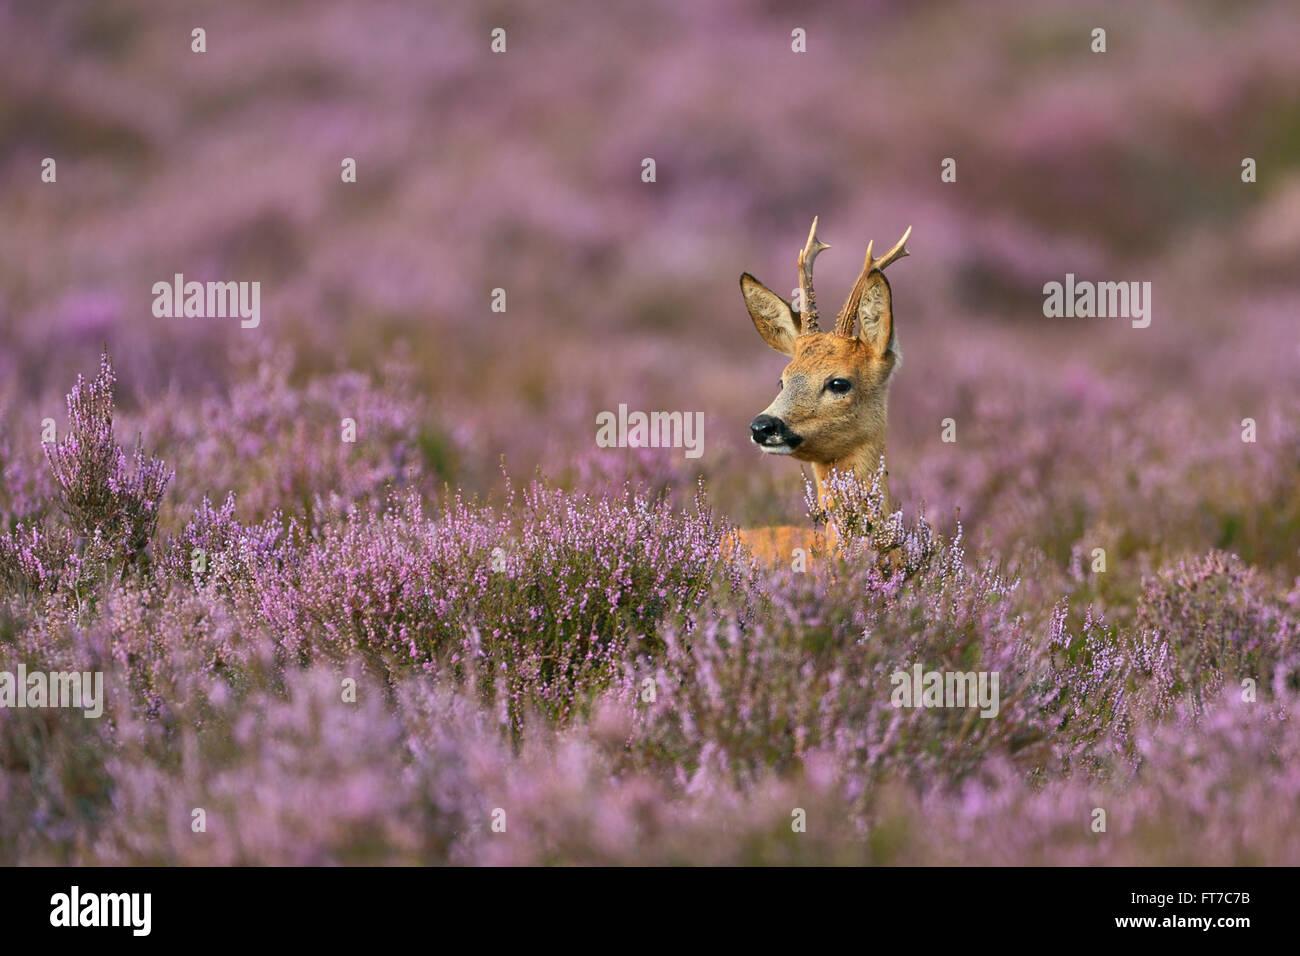 Male Roe deer / Reh / Rehbock ( Capreolus capreolus ) surrounded by wonderful purplish blooming heather. Stock Photo